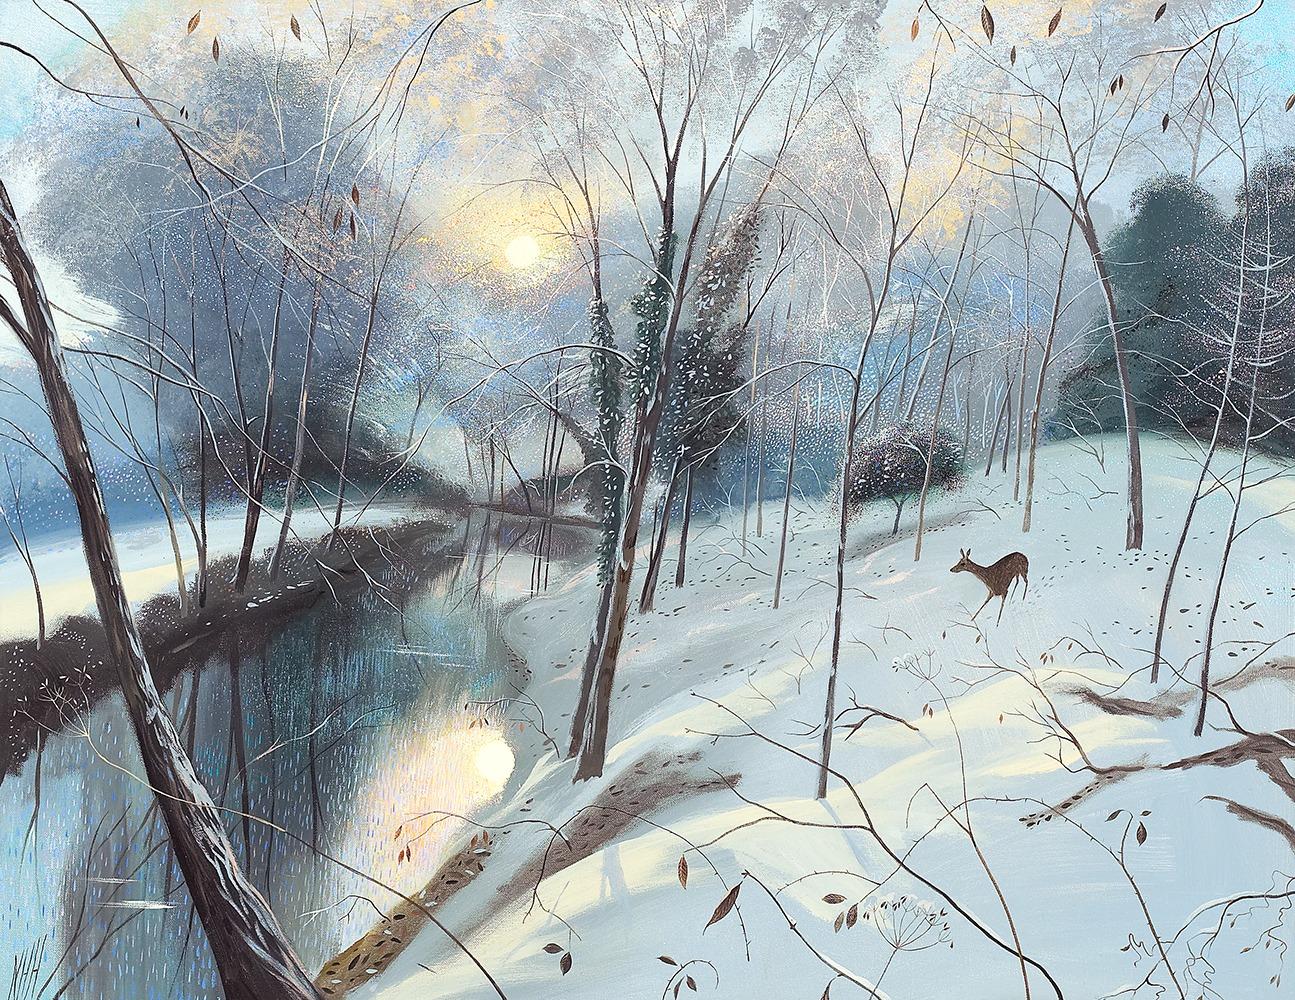 AGBI CHRISTMAS CARD 5 PACK - Winter Morning